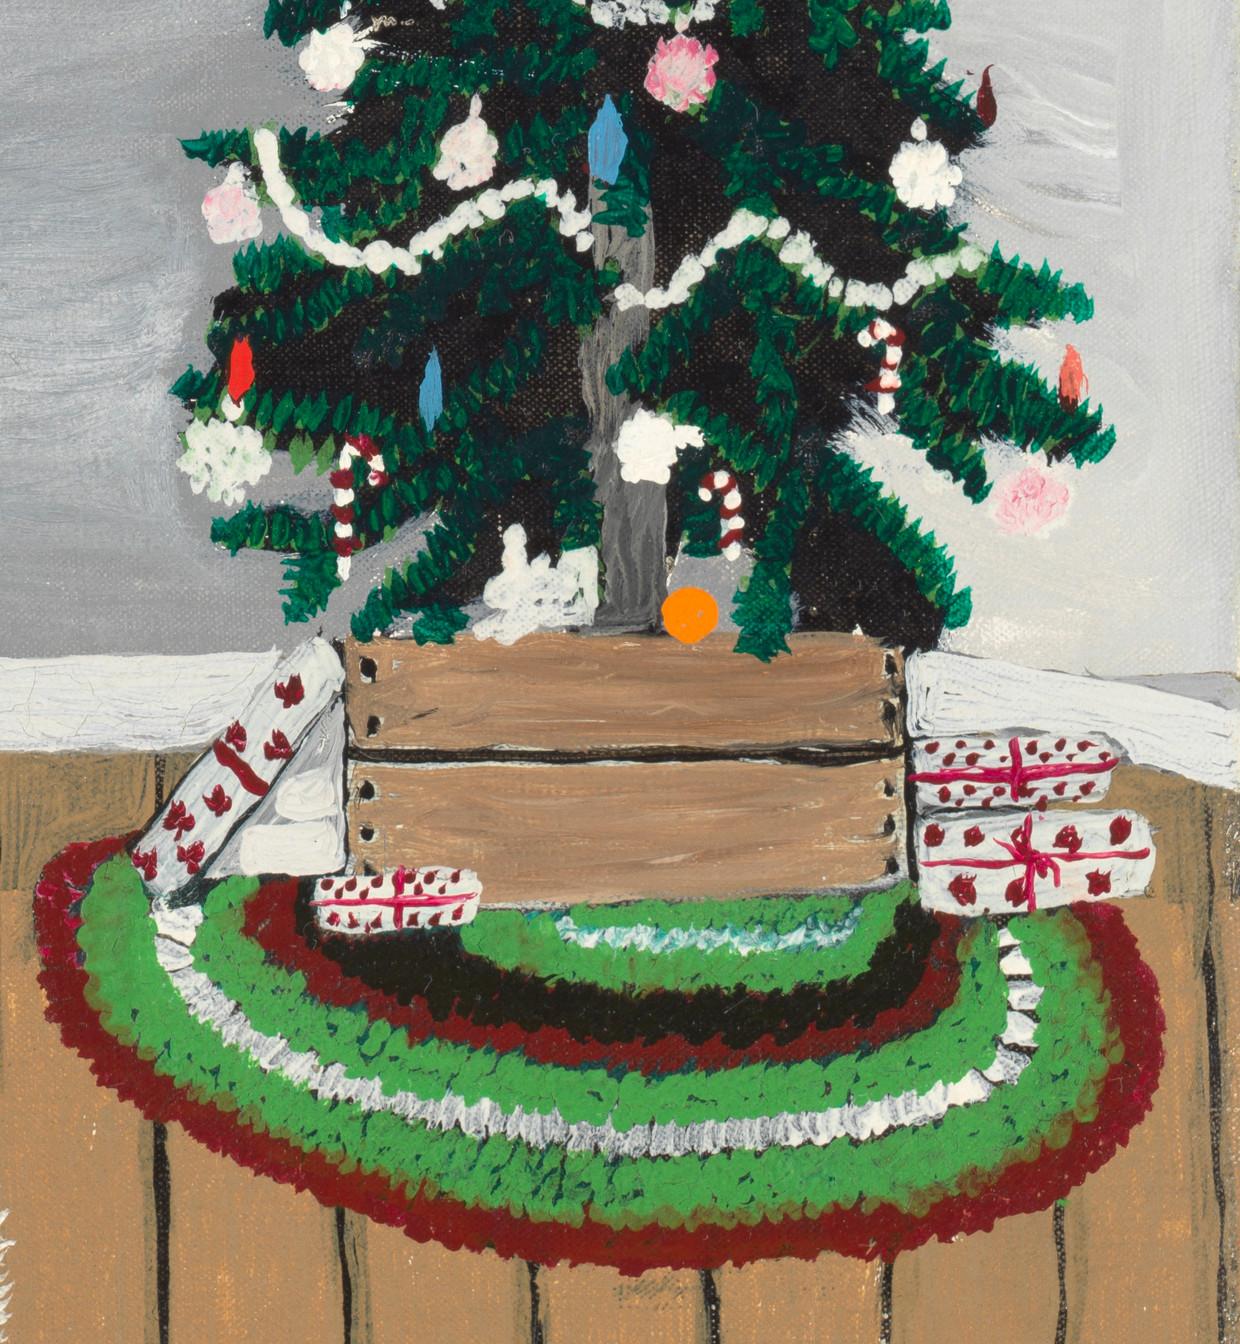 Detail uit 'Christmas Morning, Breakfast' van Horace Pippin. Beeld Cincinnati Art Museum